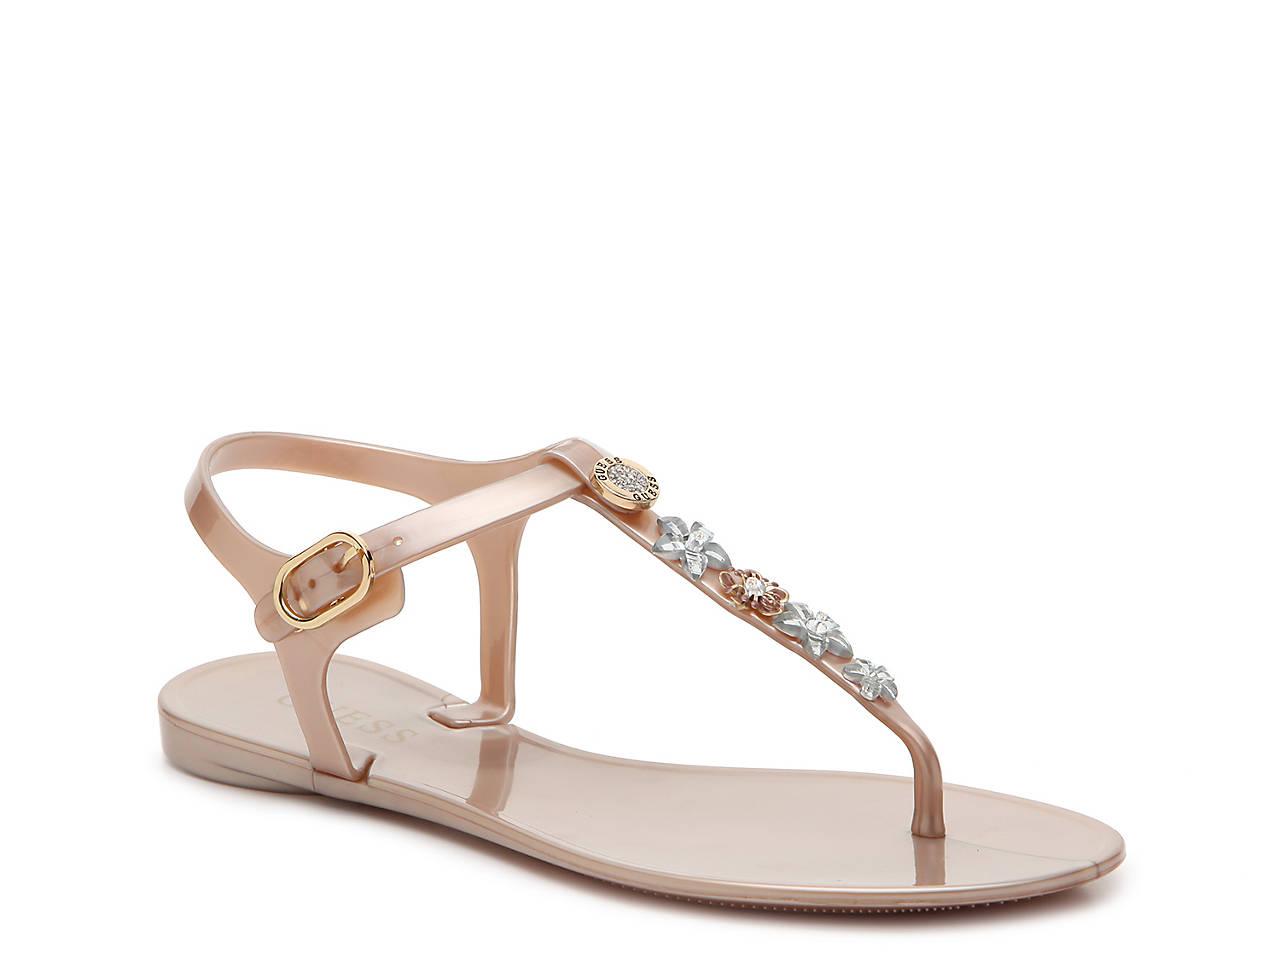 84a75c05528 Guess Addison Flat Sandal Women s Shoes